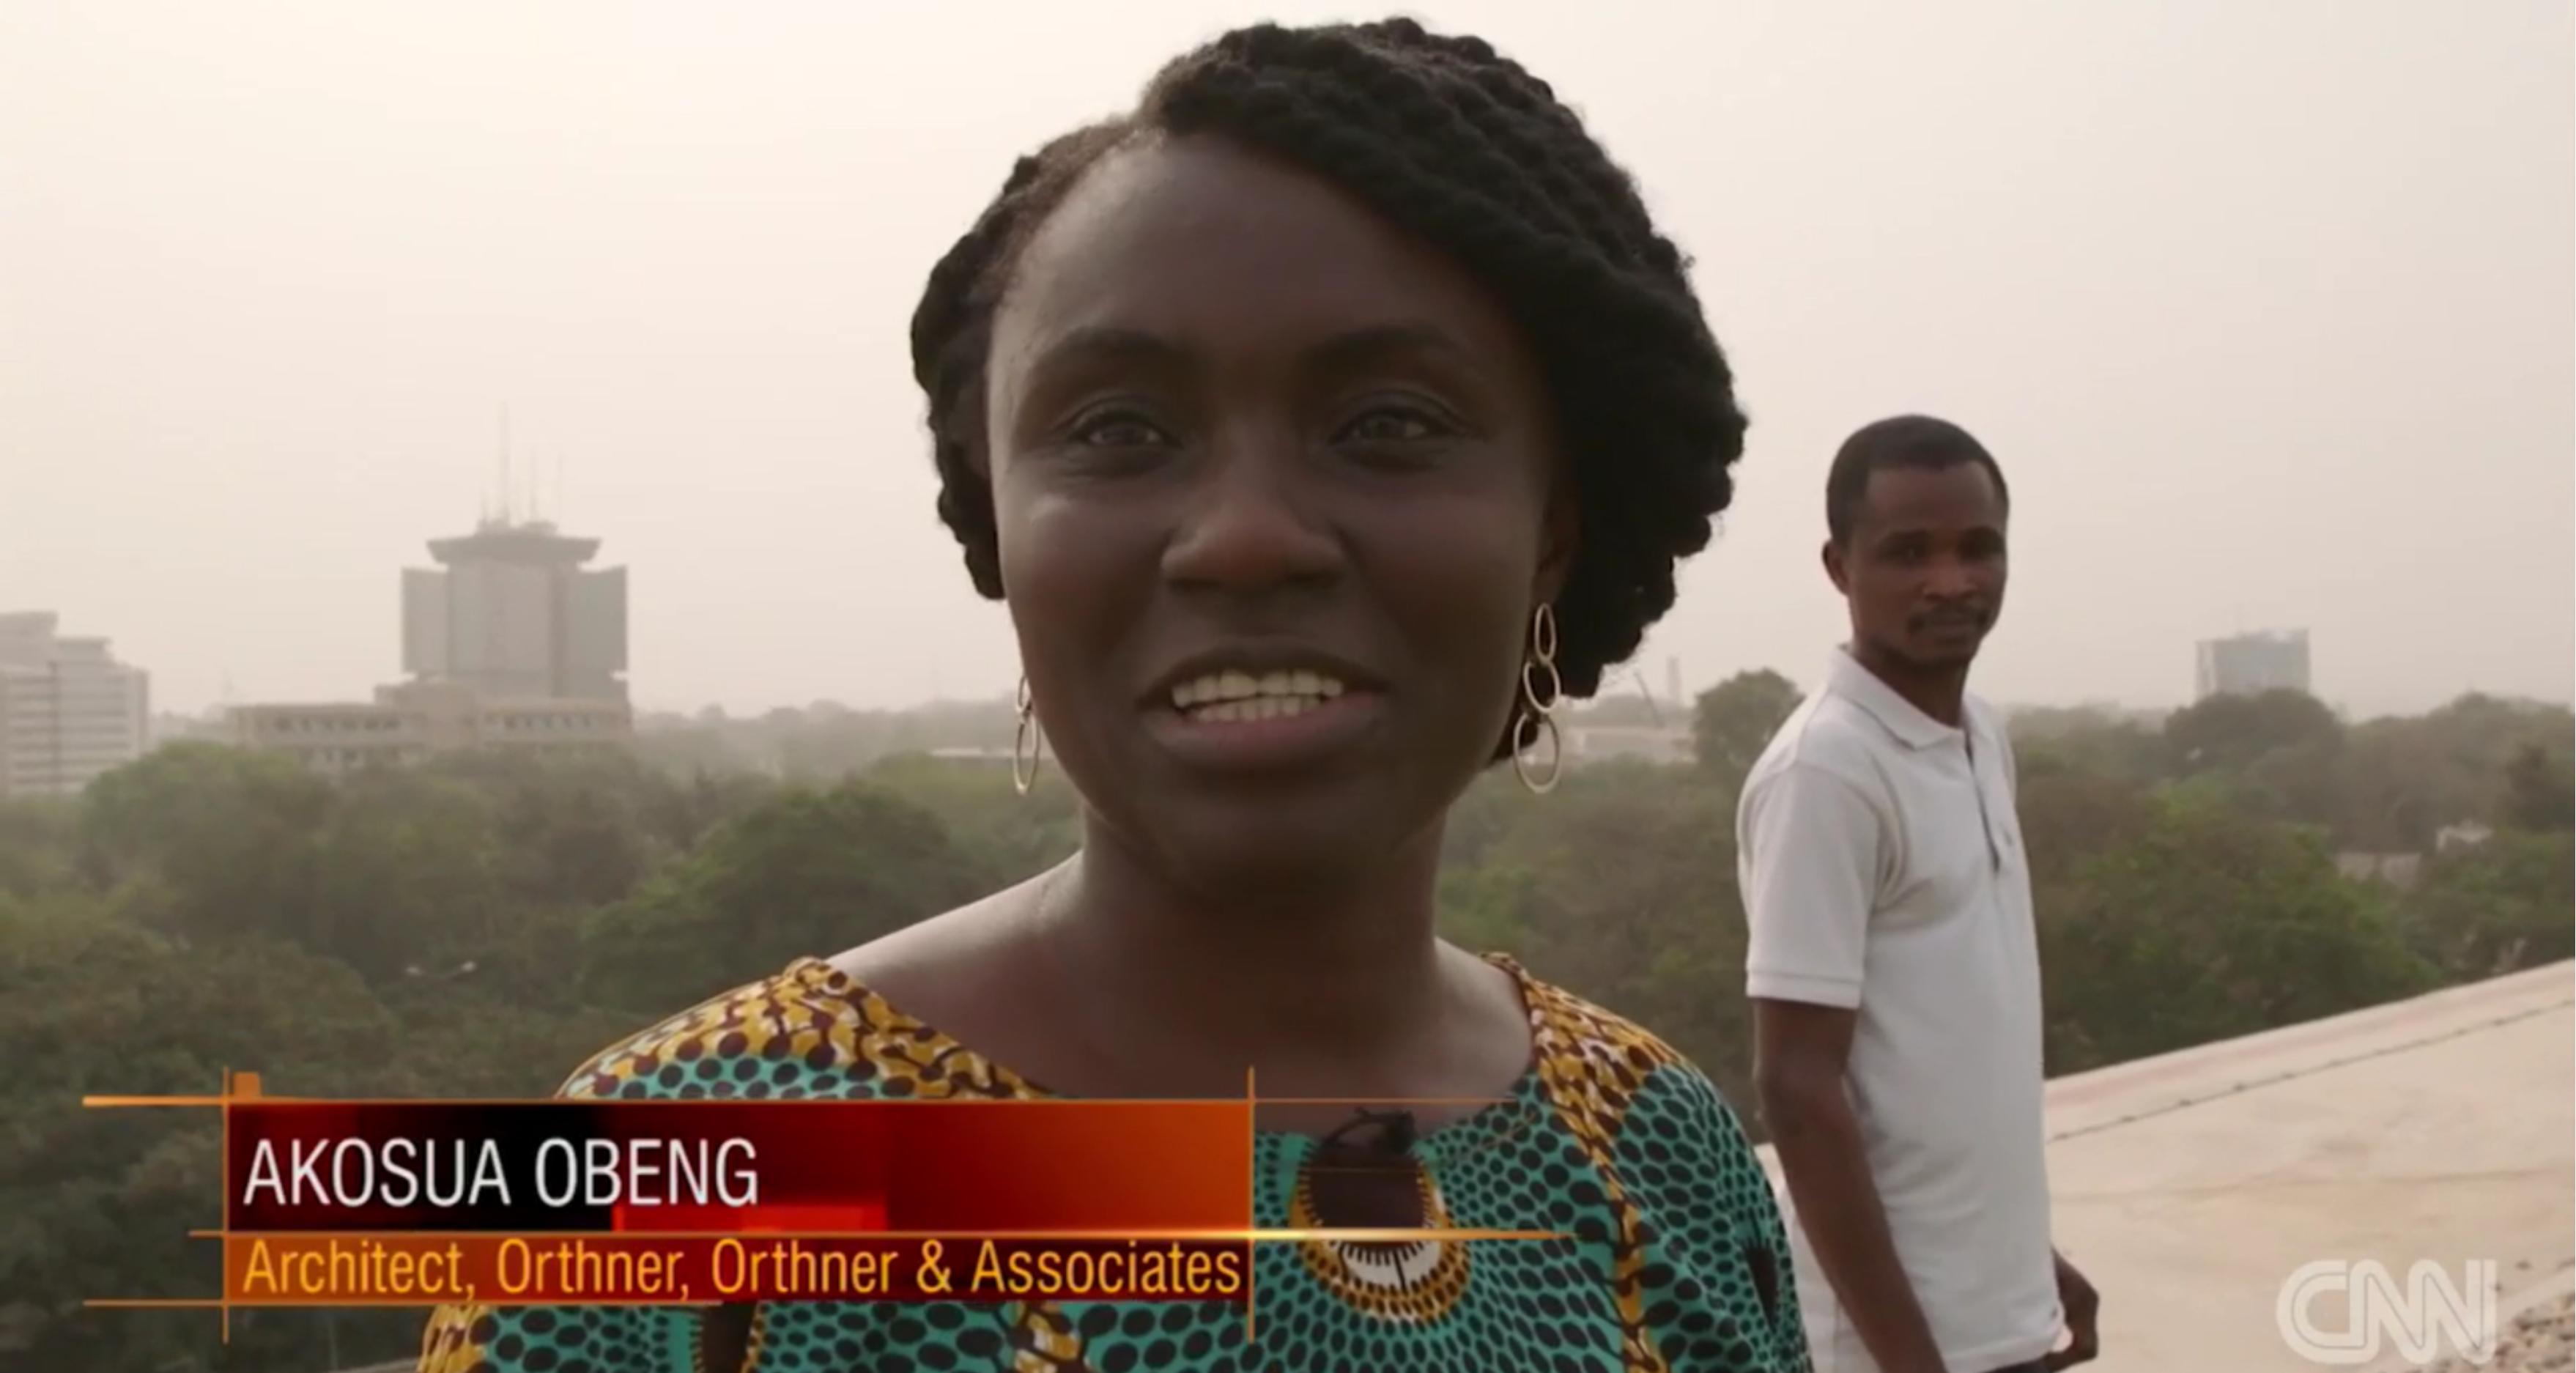 inside-africa-akosua-obeng-2